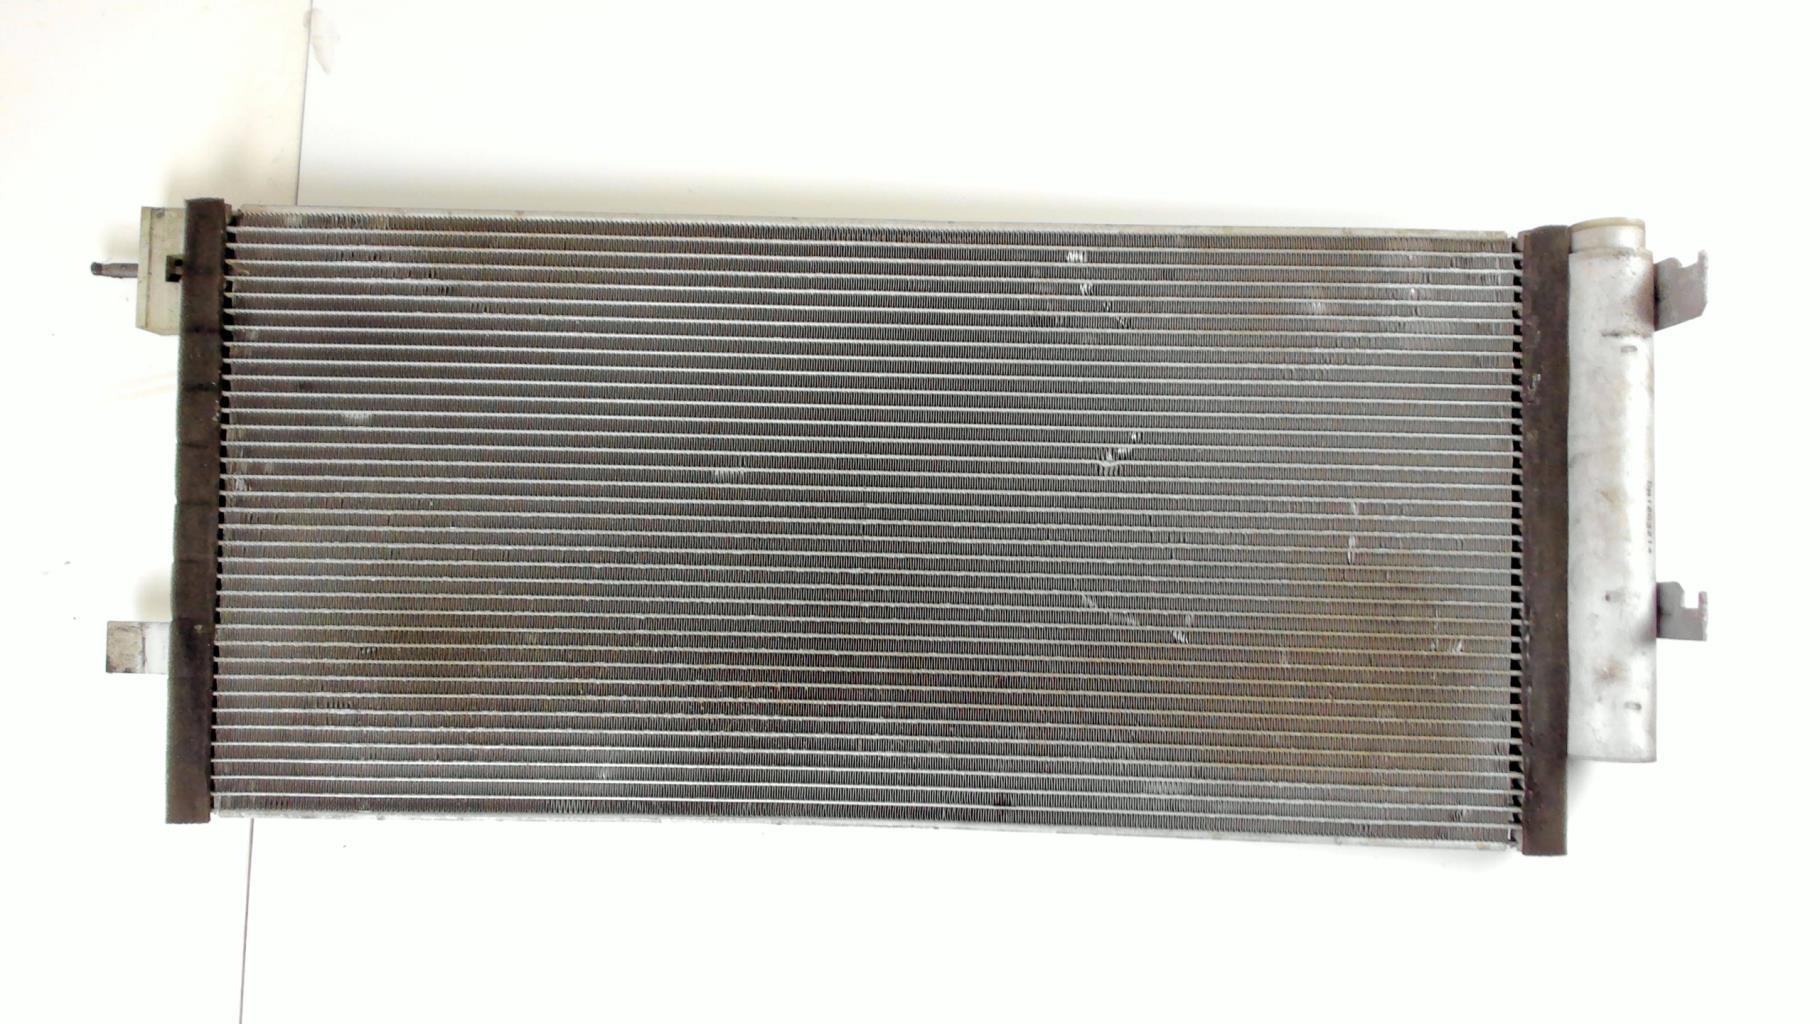 Image Condenseur de clim - CHEVROLET AVEO 2